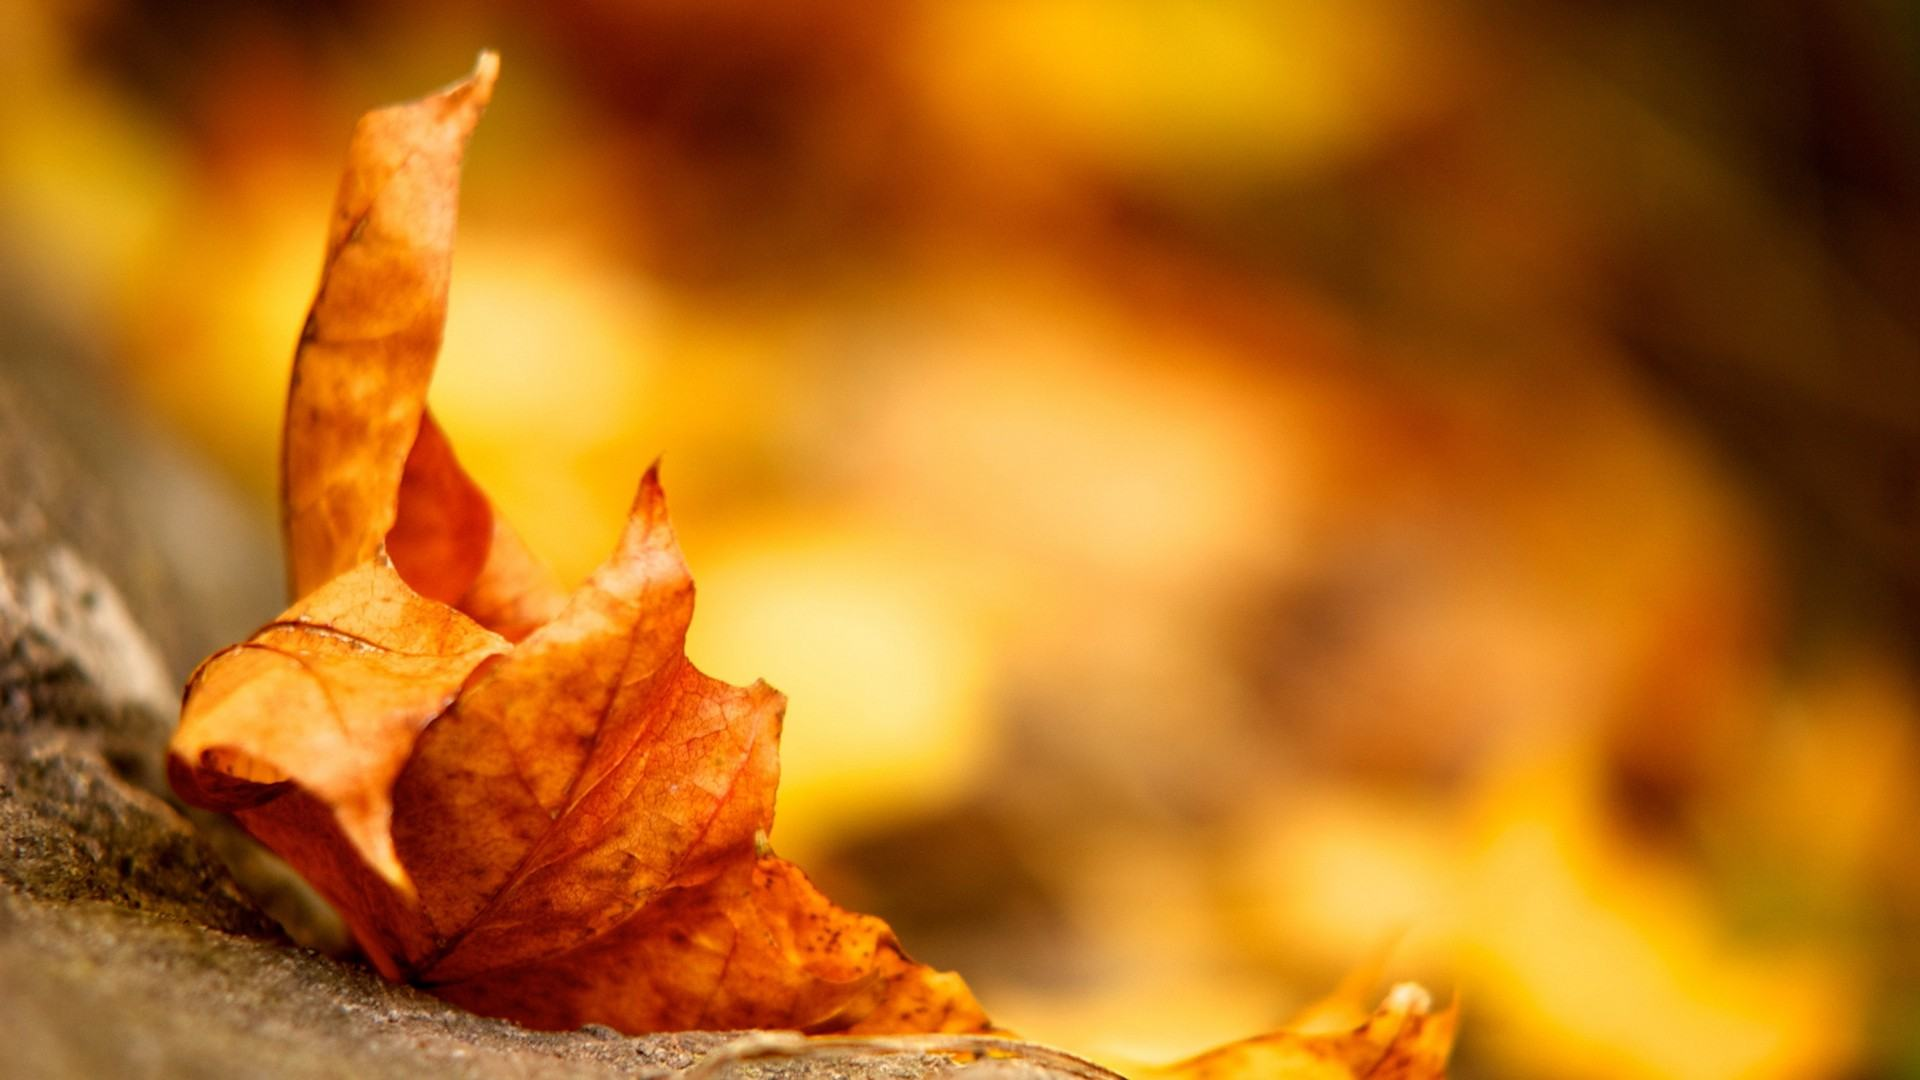 fall autumn season wallpaper nature background lifechurch